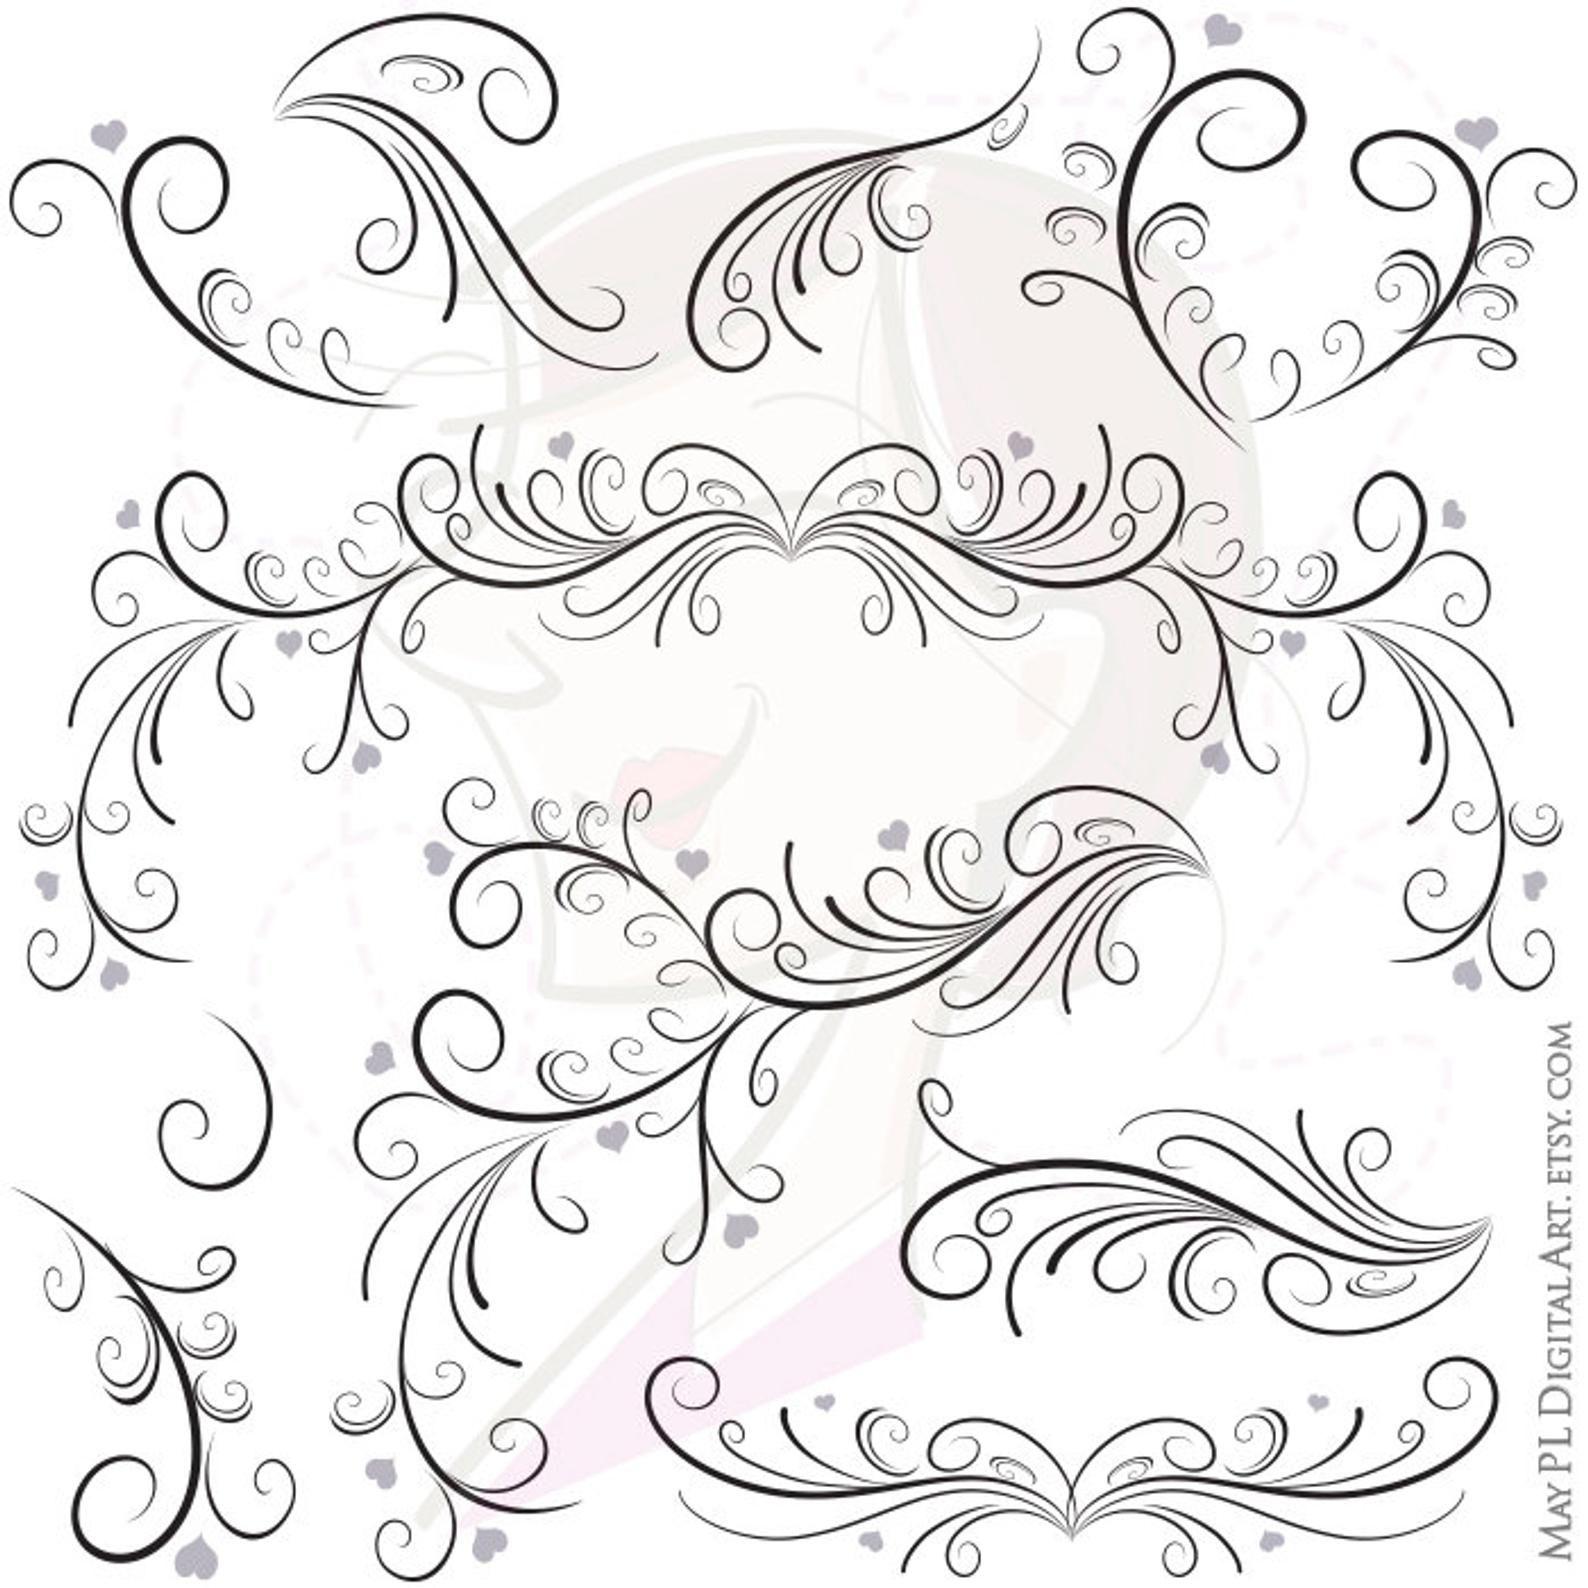 Swirl Border Png Vector Clipart Easily Insert These Digital Etsy Clip Art Vintage Clip Art Borders Clip Art